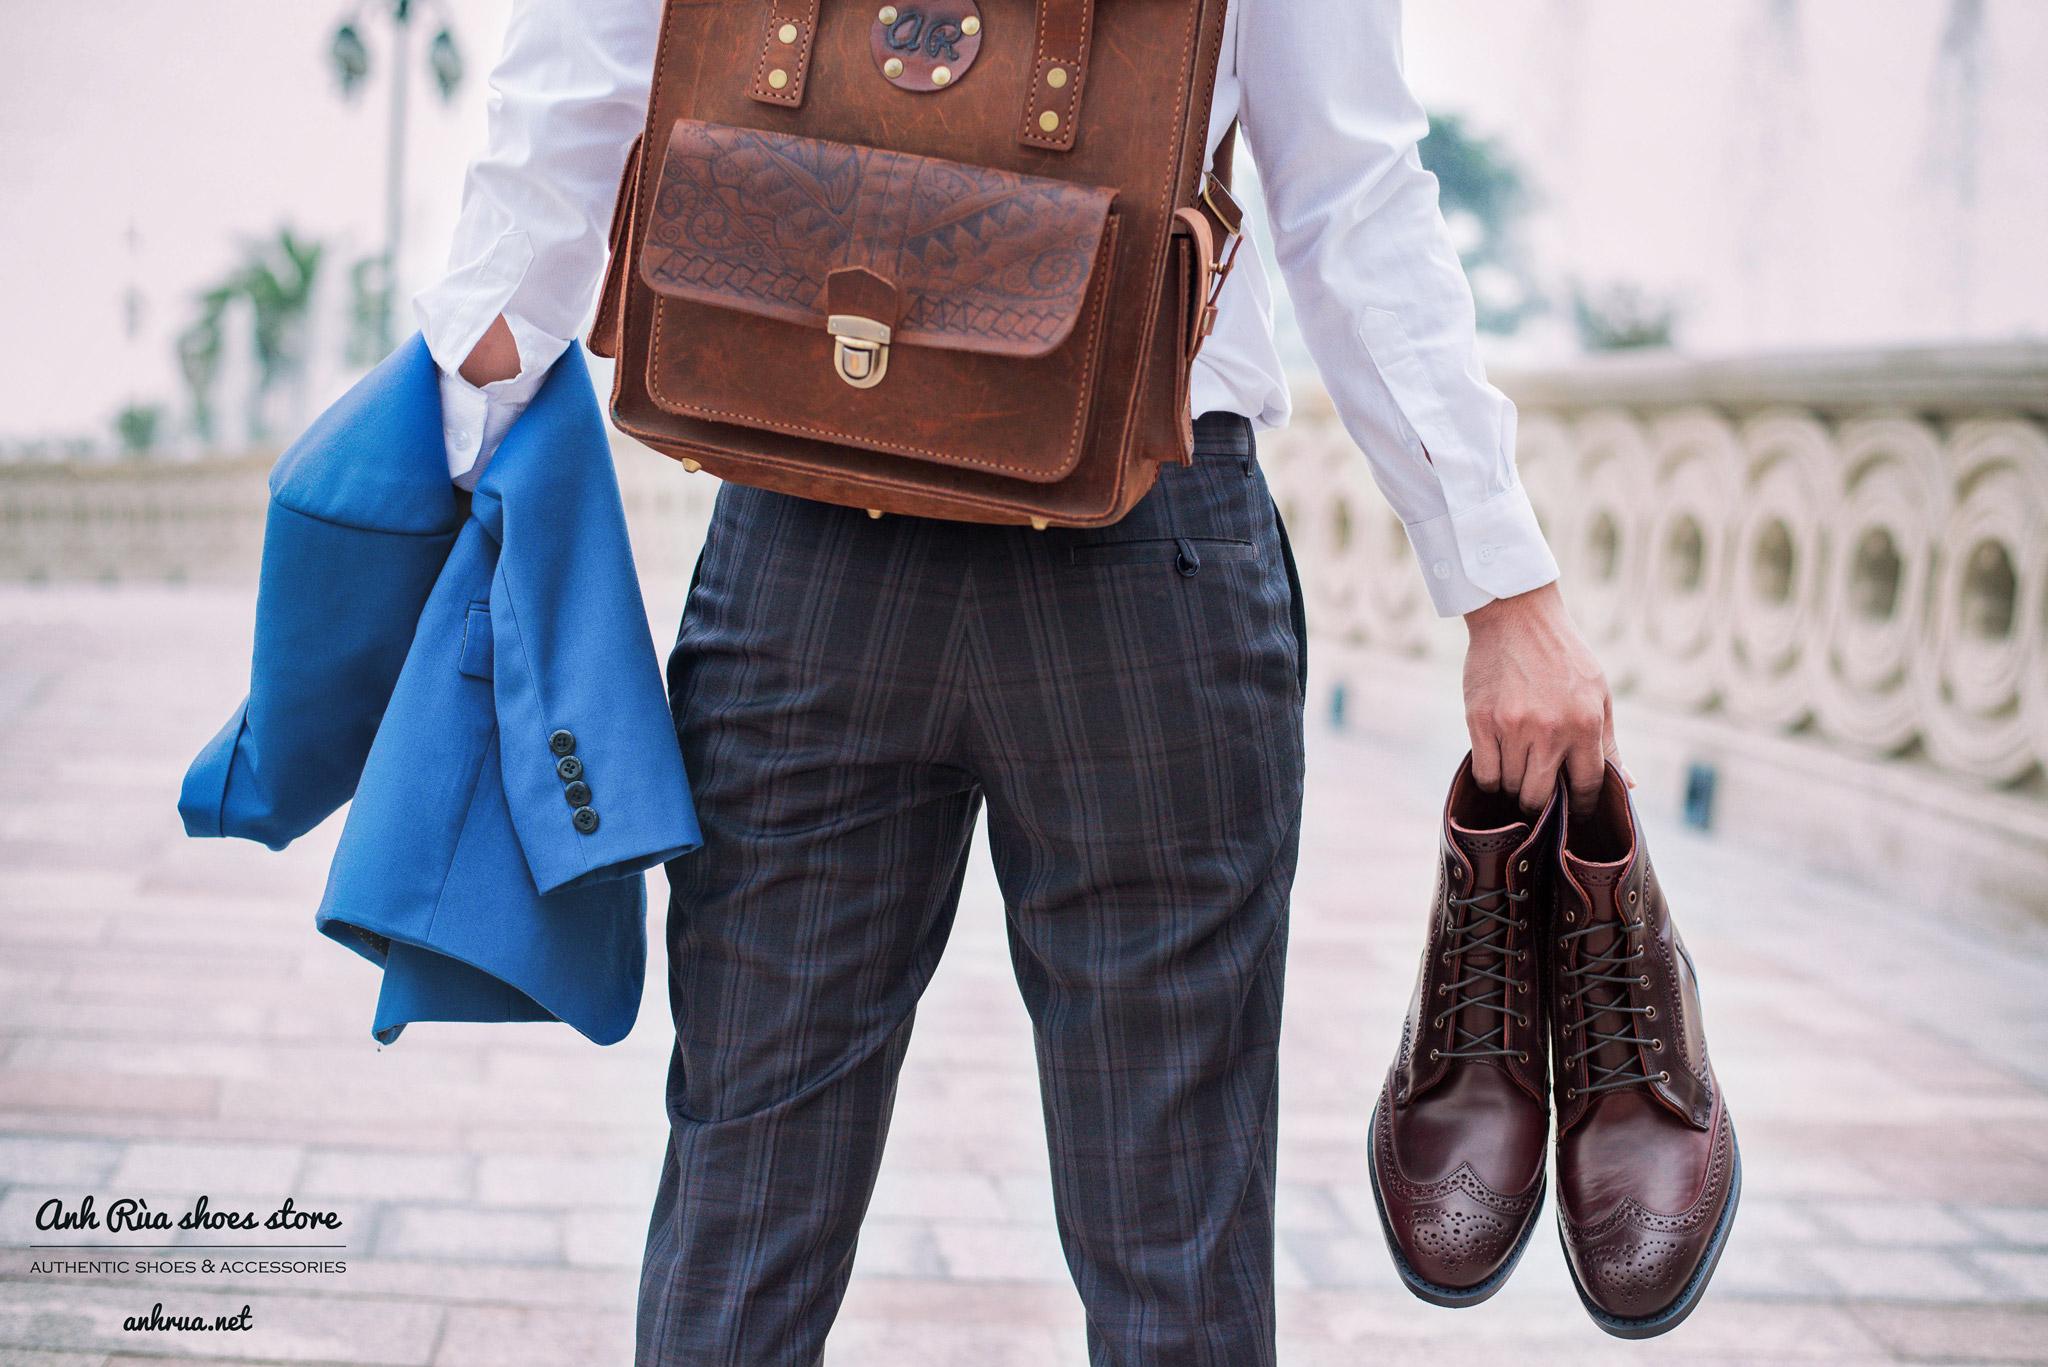 Cordovan Full Brogues Dress Boots Allen Edmonds